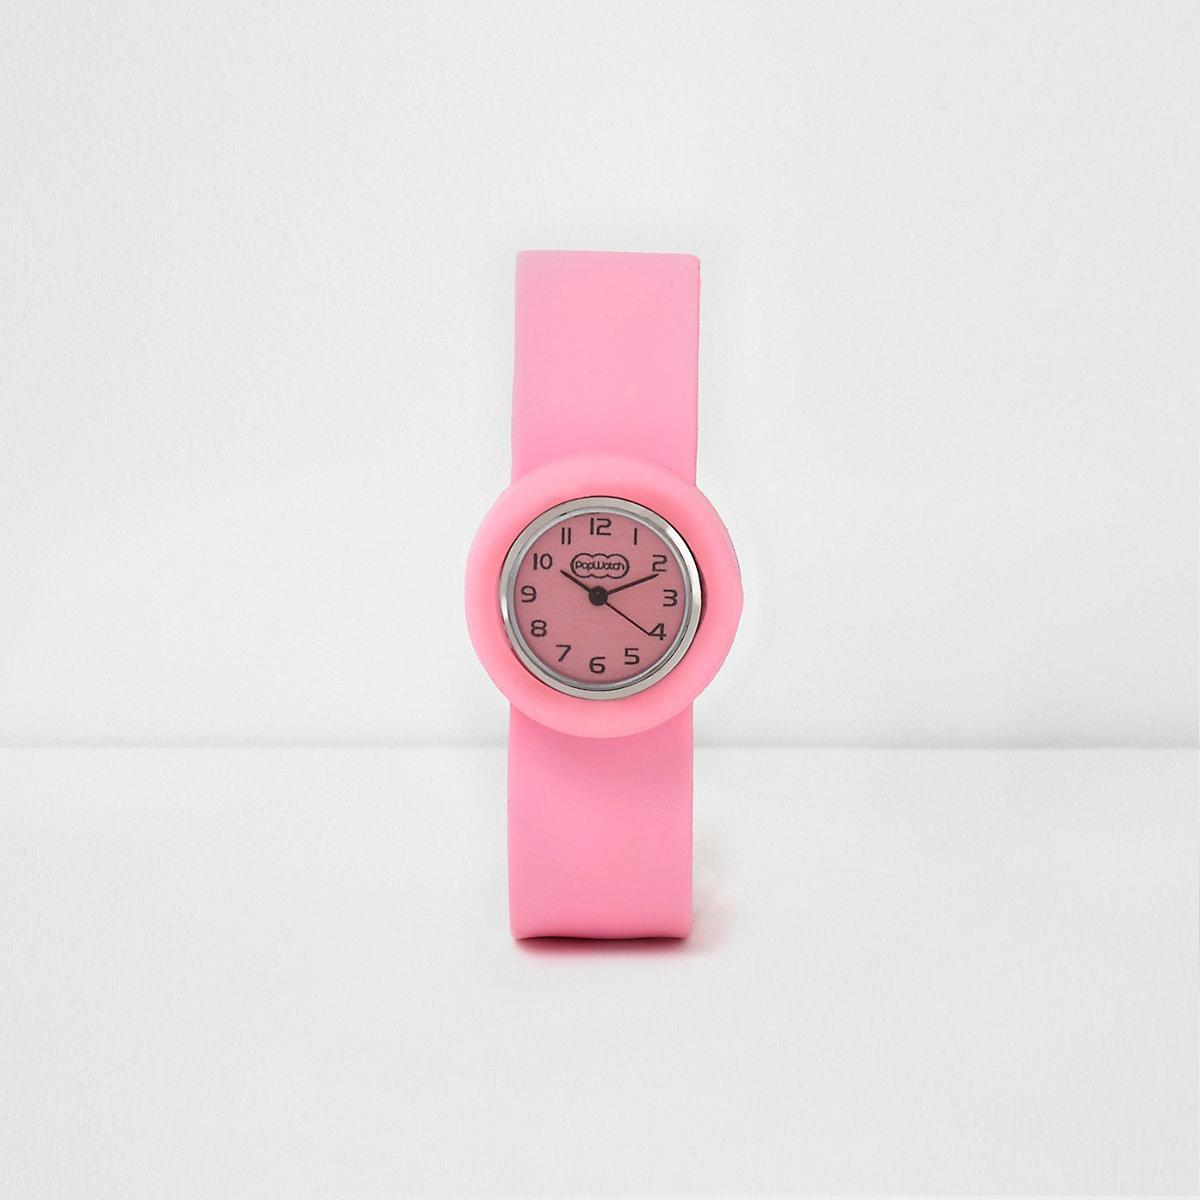 Girls light pink snap on watch